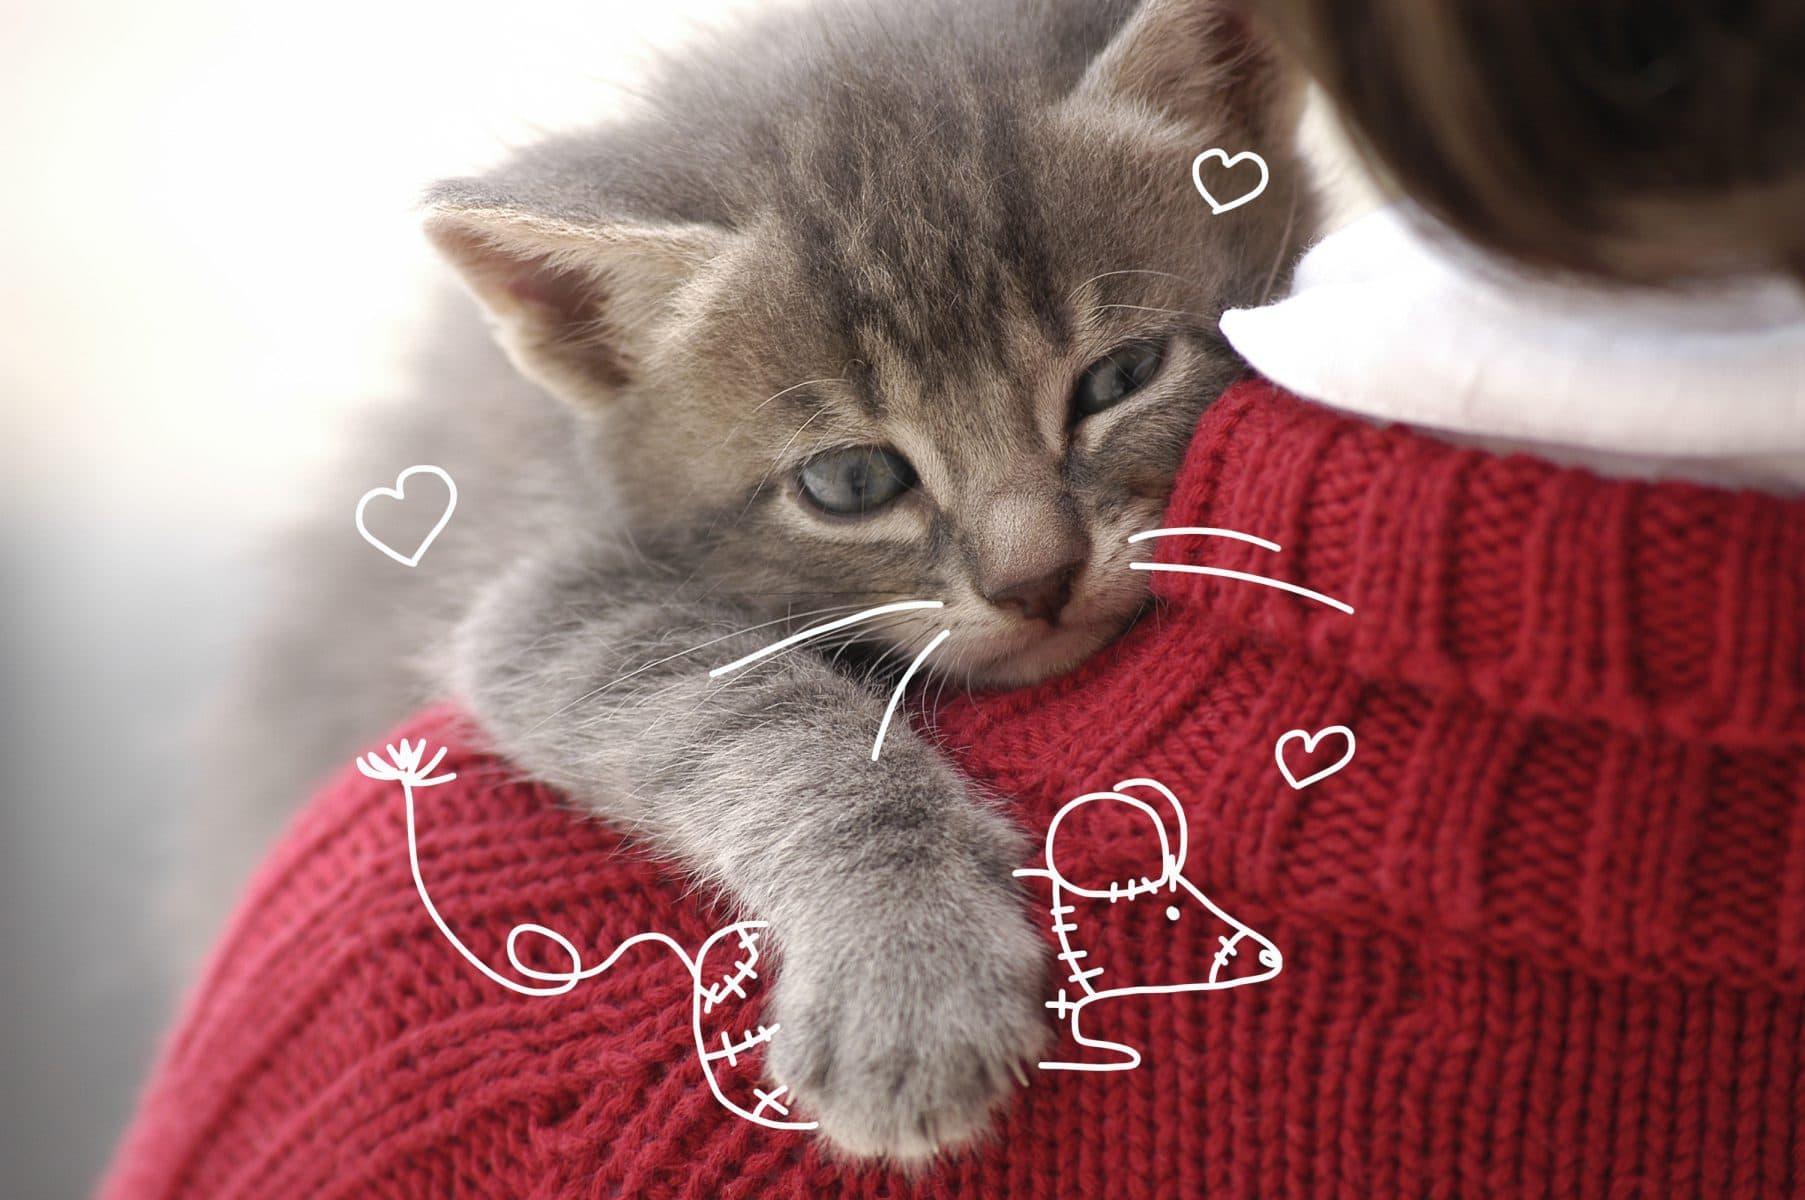 kitten insurance -Welcoming you new kitten to the family